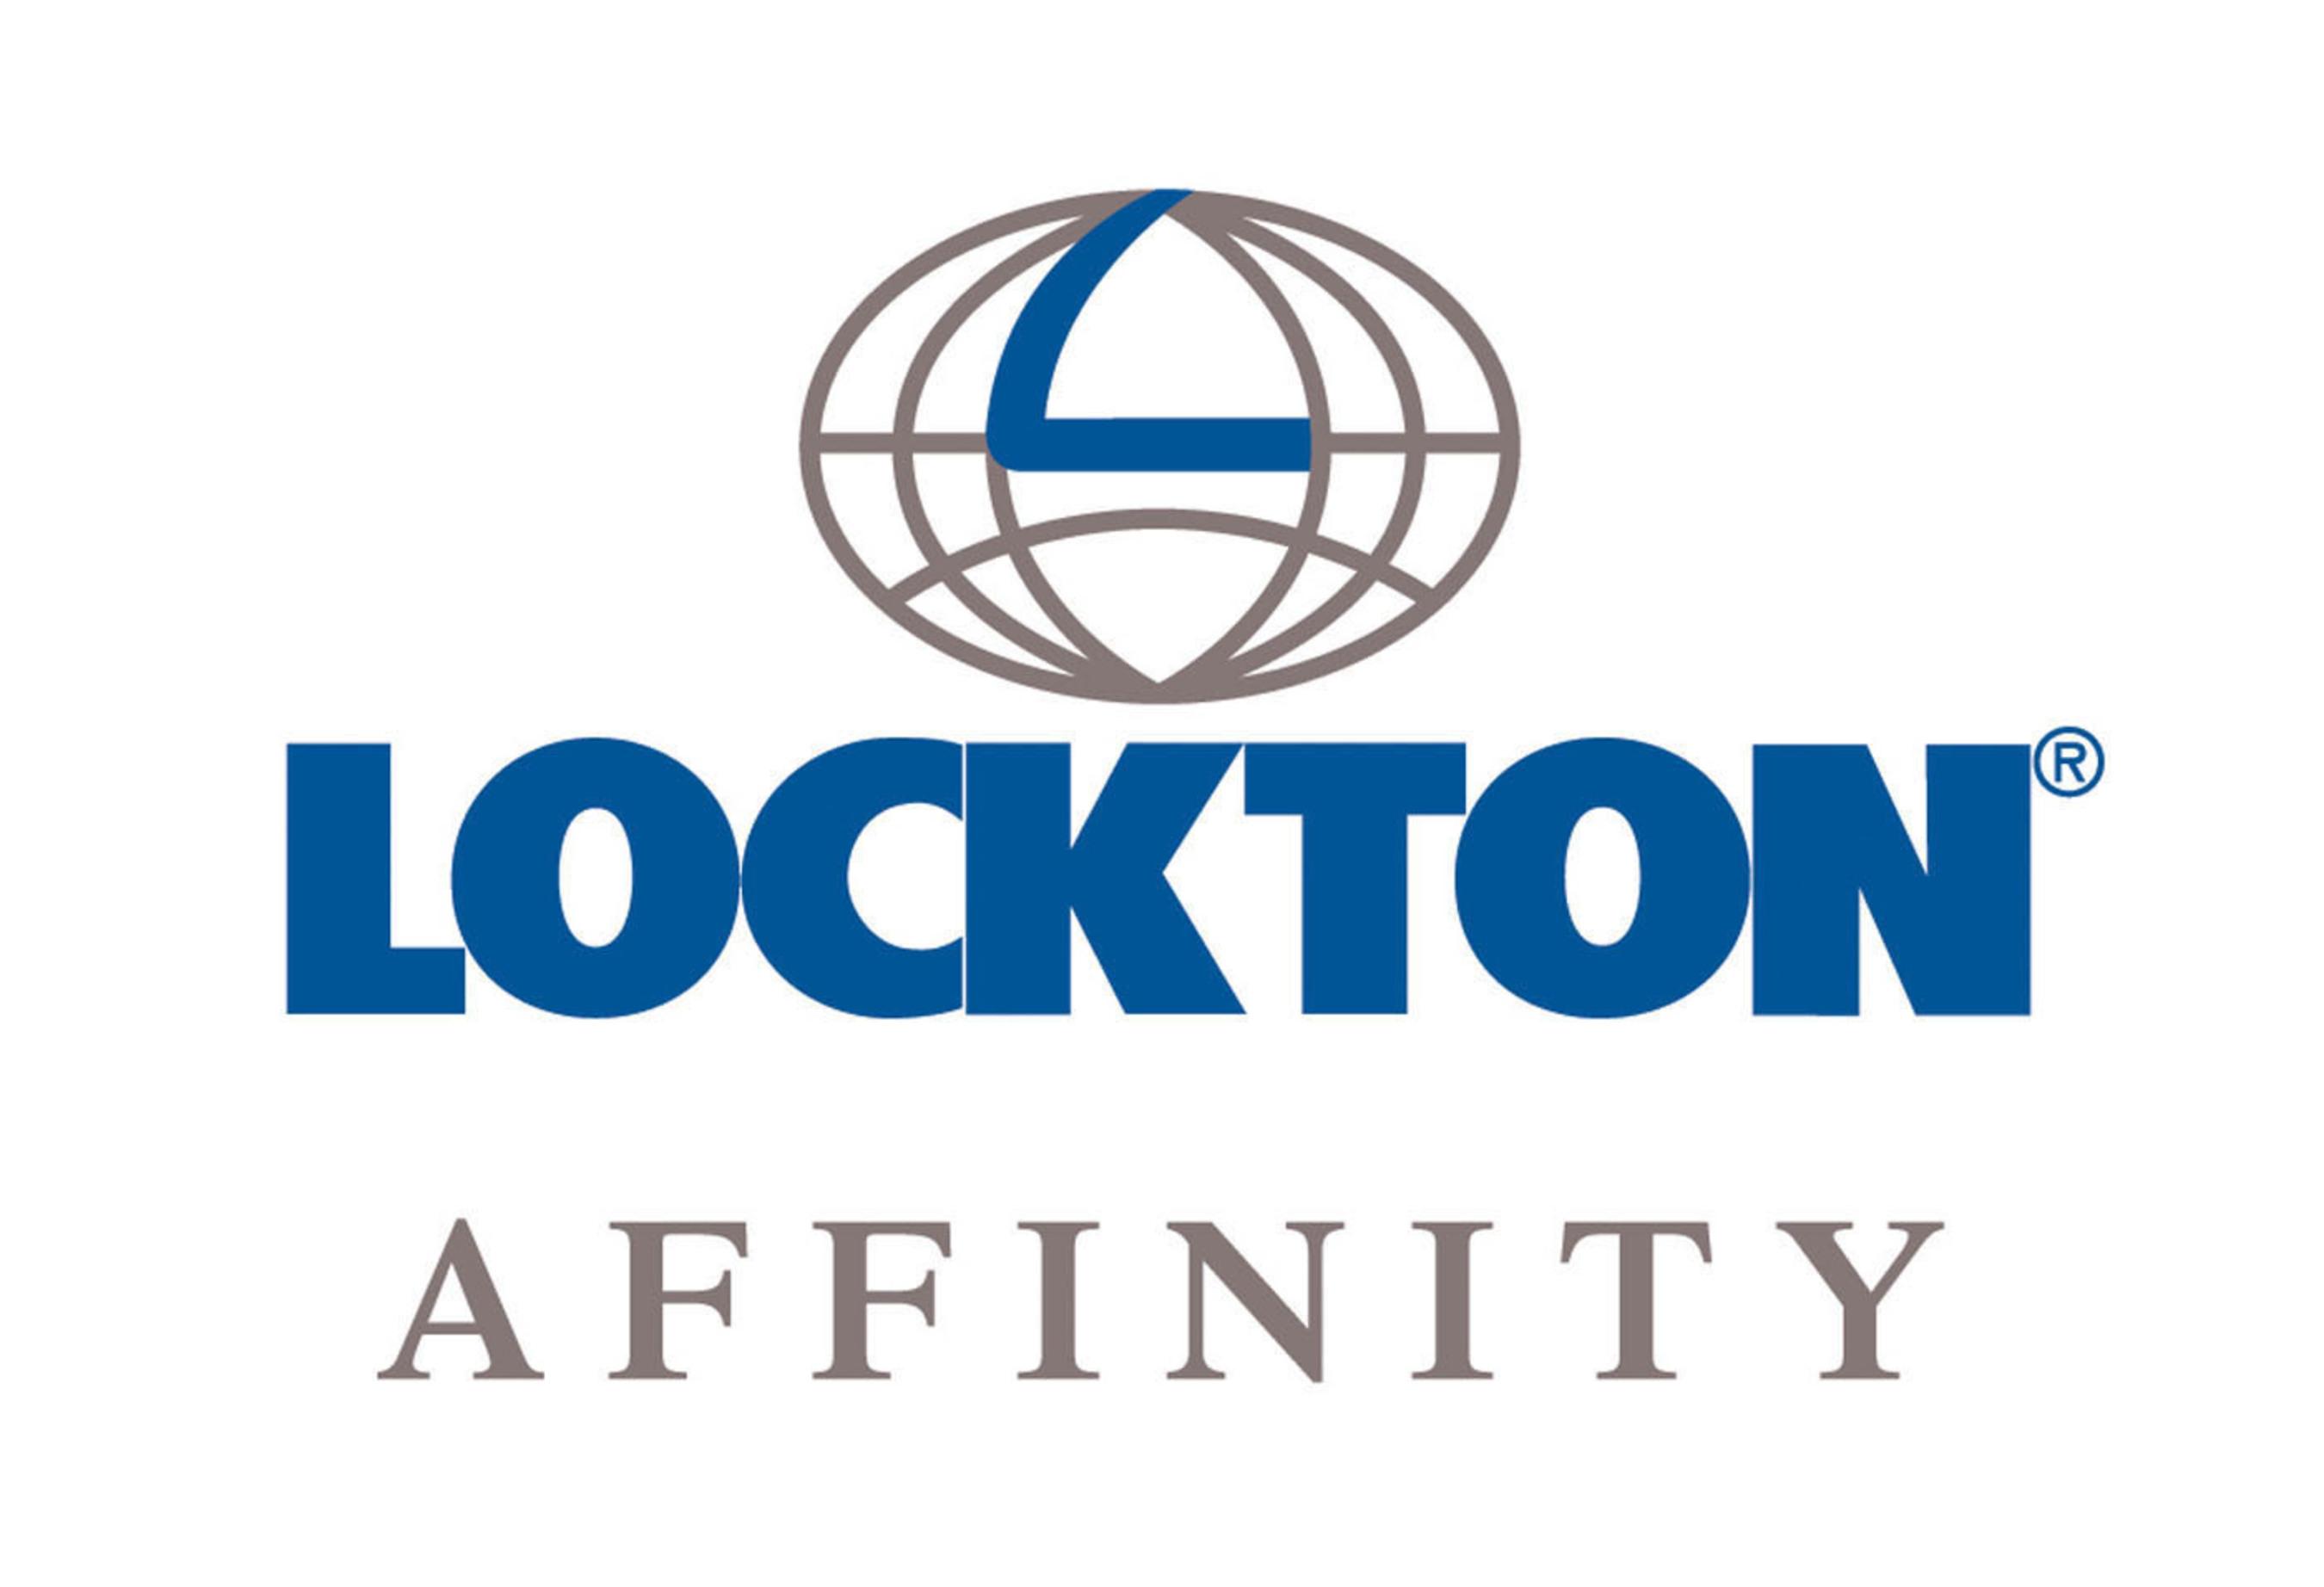 Lockton Affinity - Overland Park KS 66210 | 913-652-7500 | Insurance